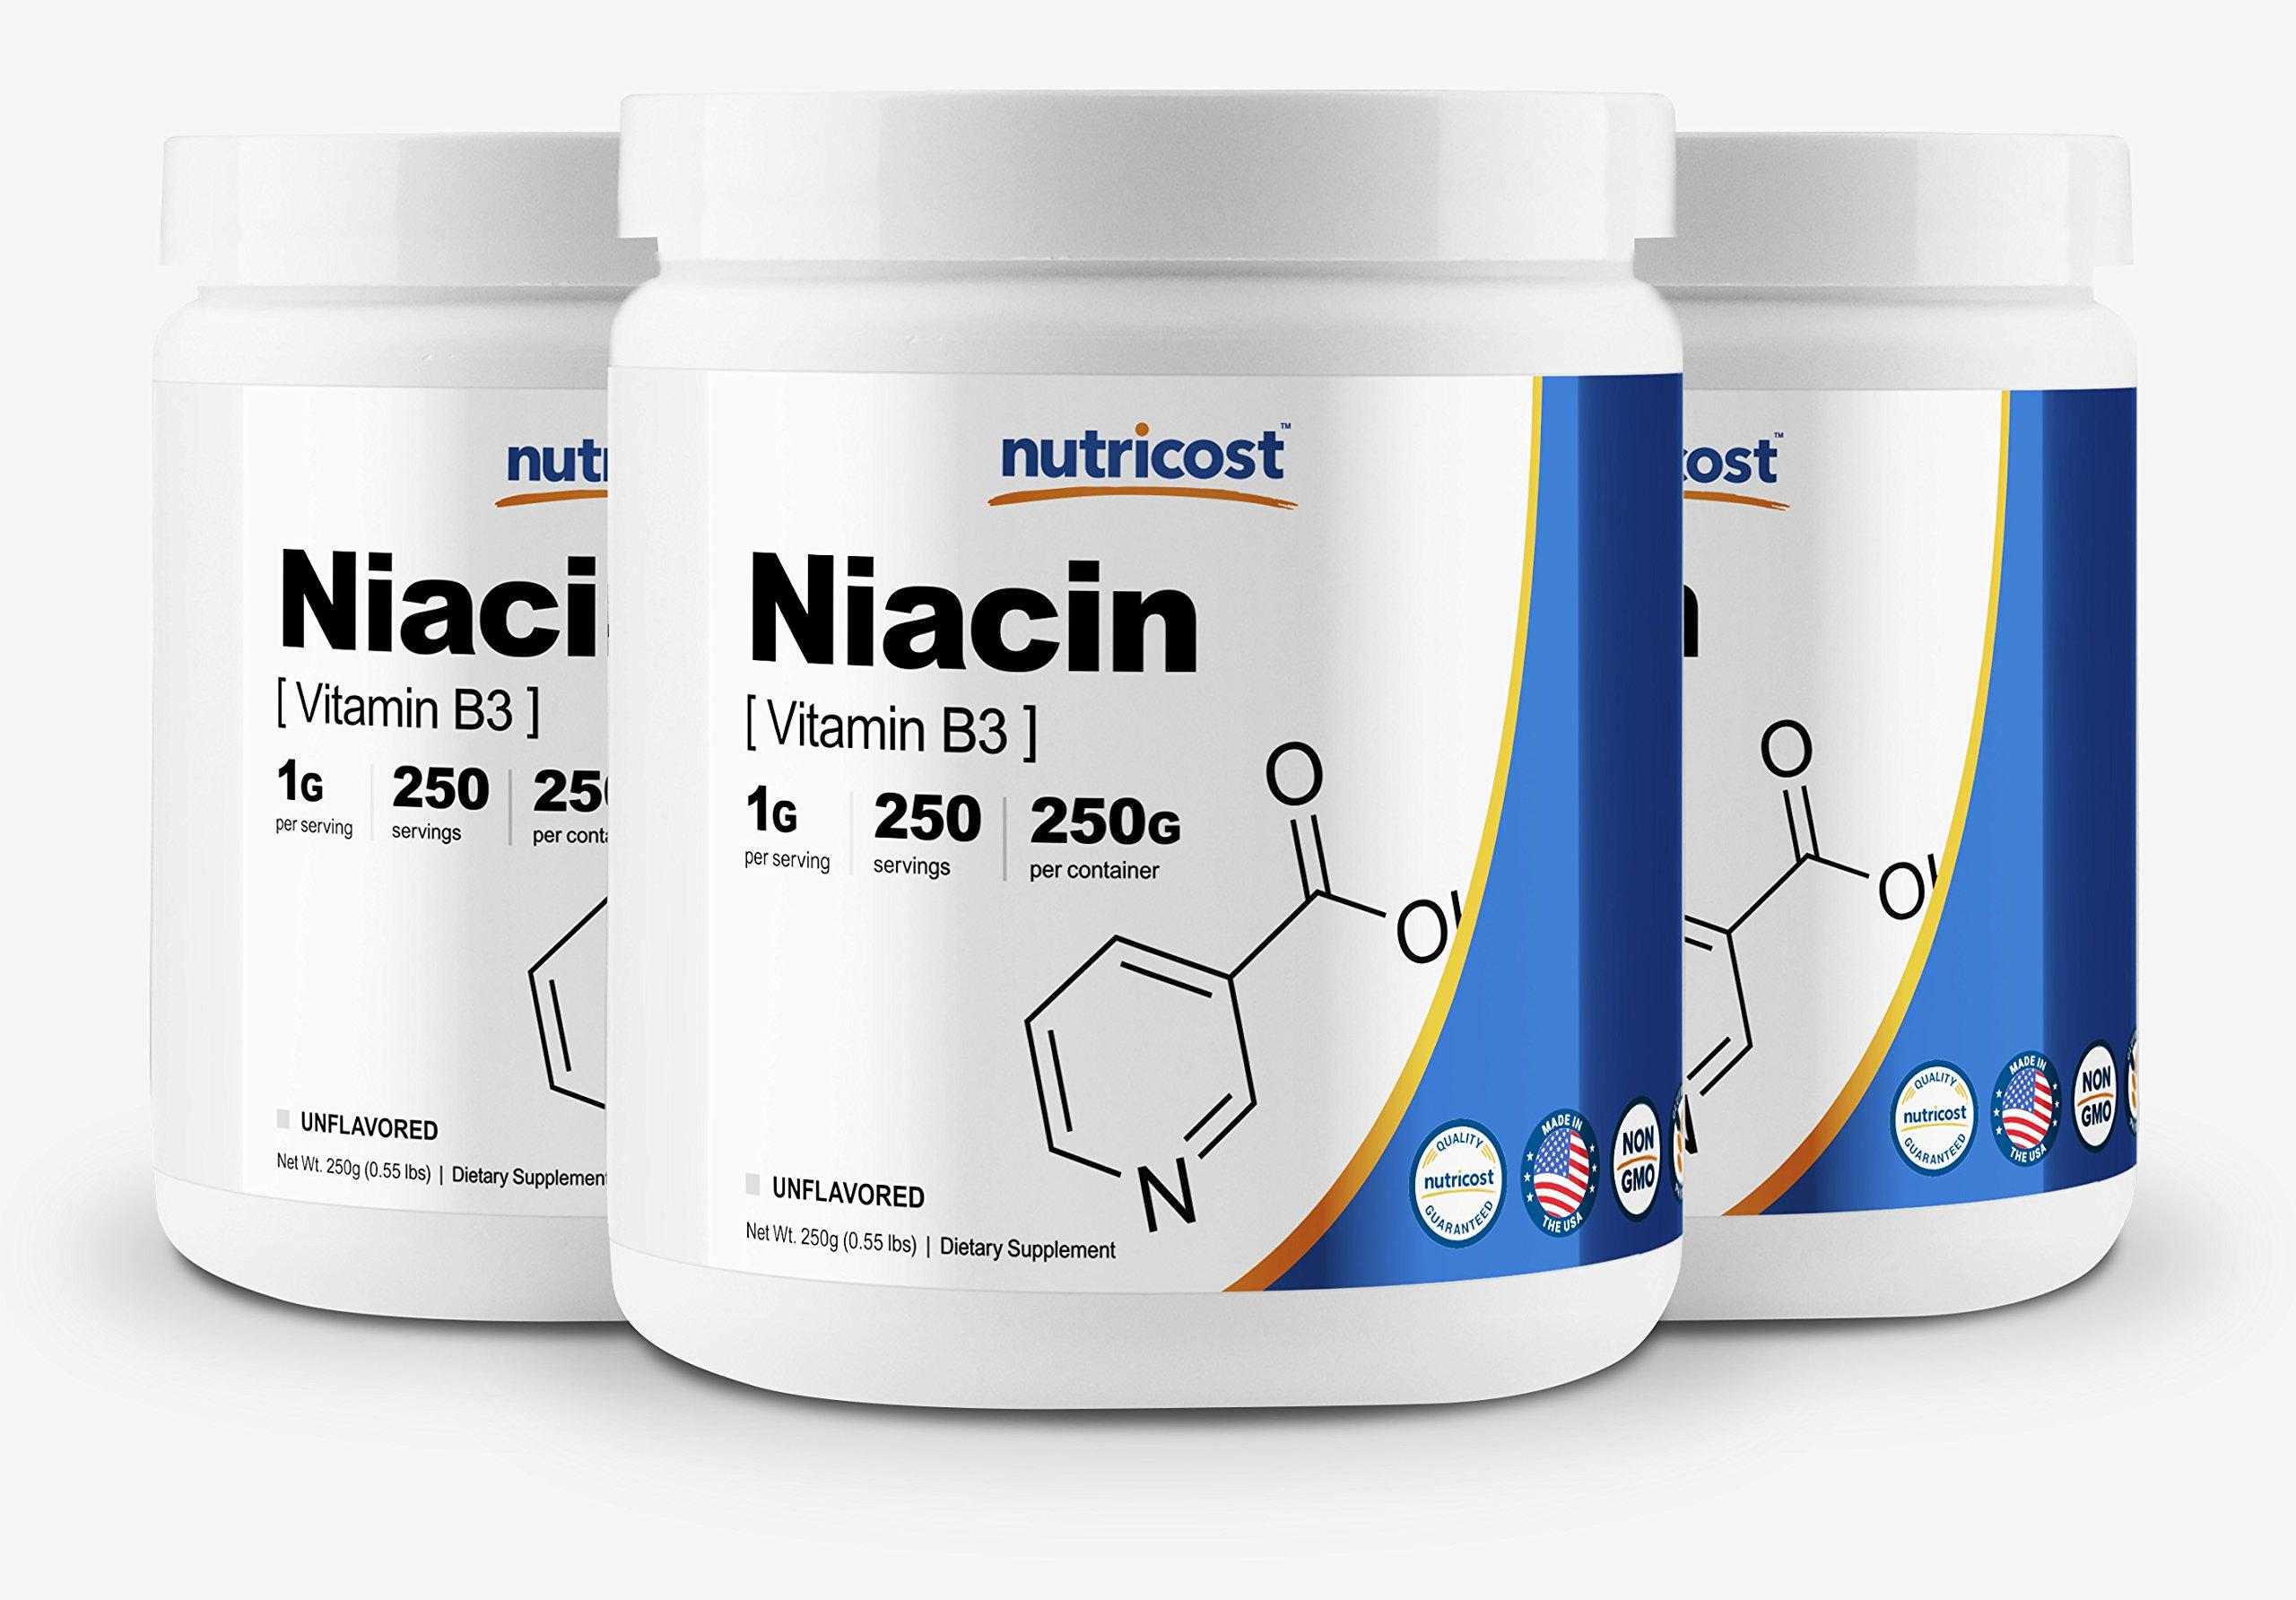 Nutricost Niacin Vitamin B3 Powder 250G (3 Pack) - 750 Grams - 1G Per Serv - Pure, High Quality Powder